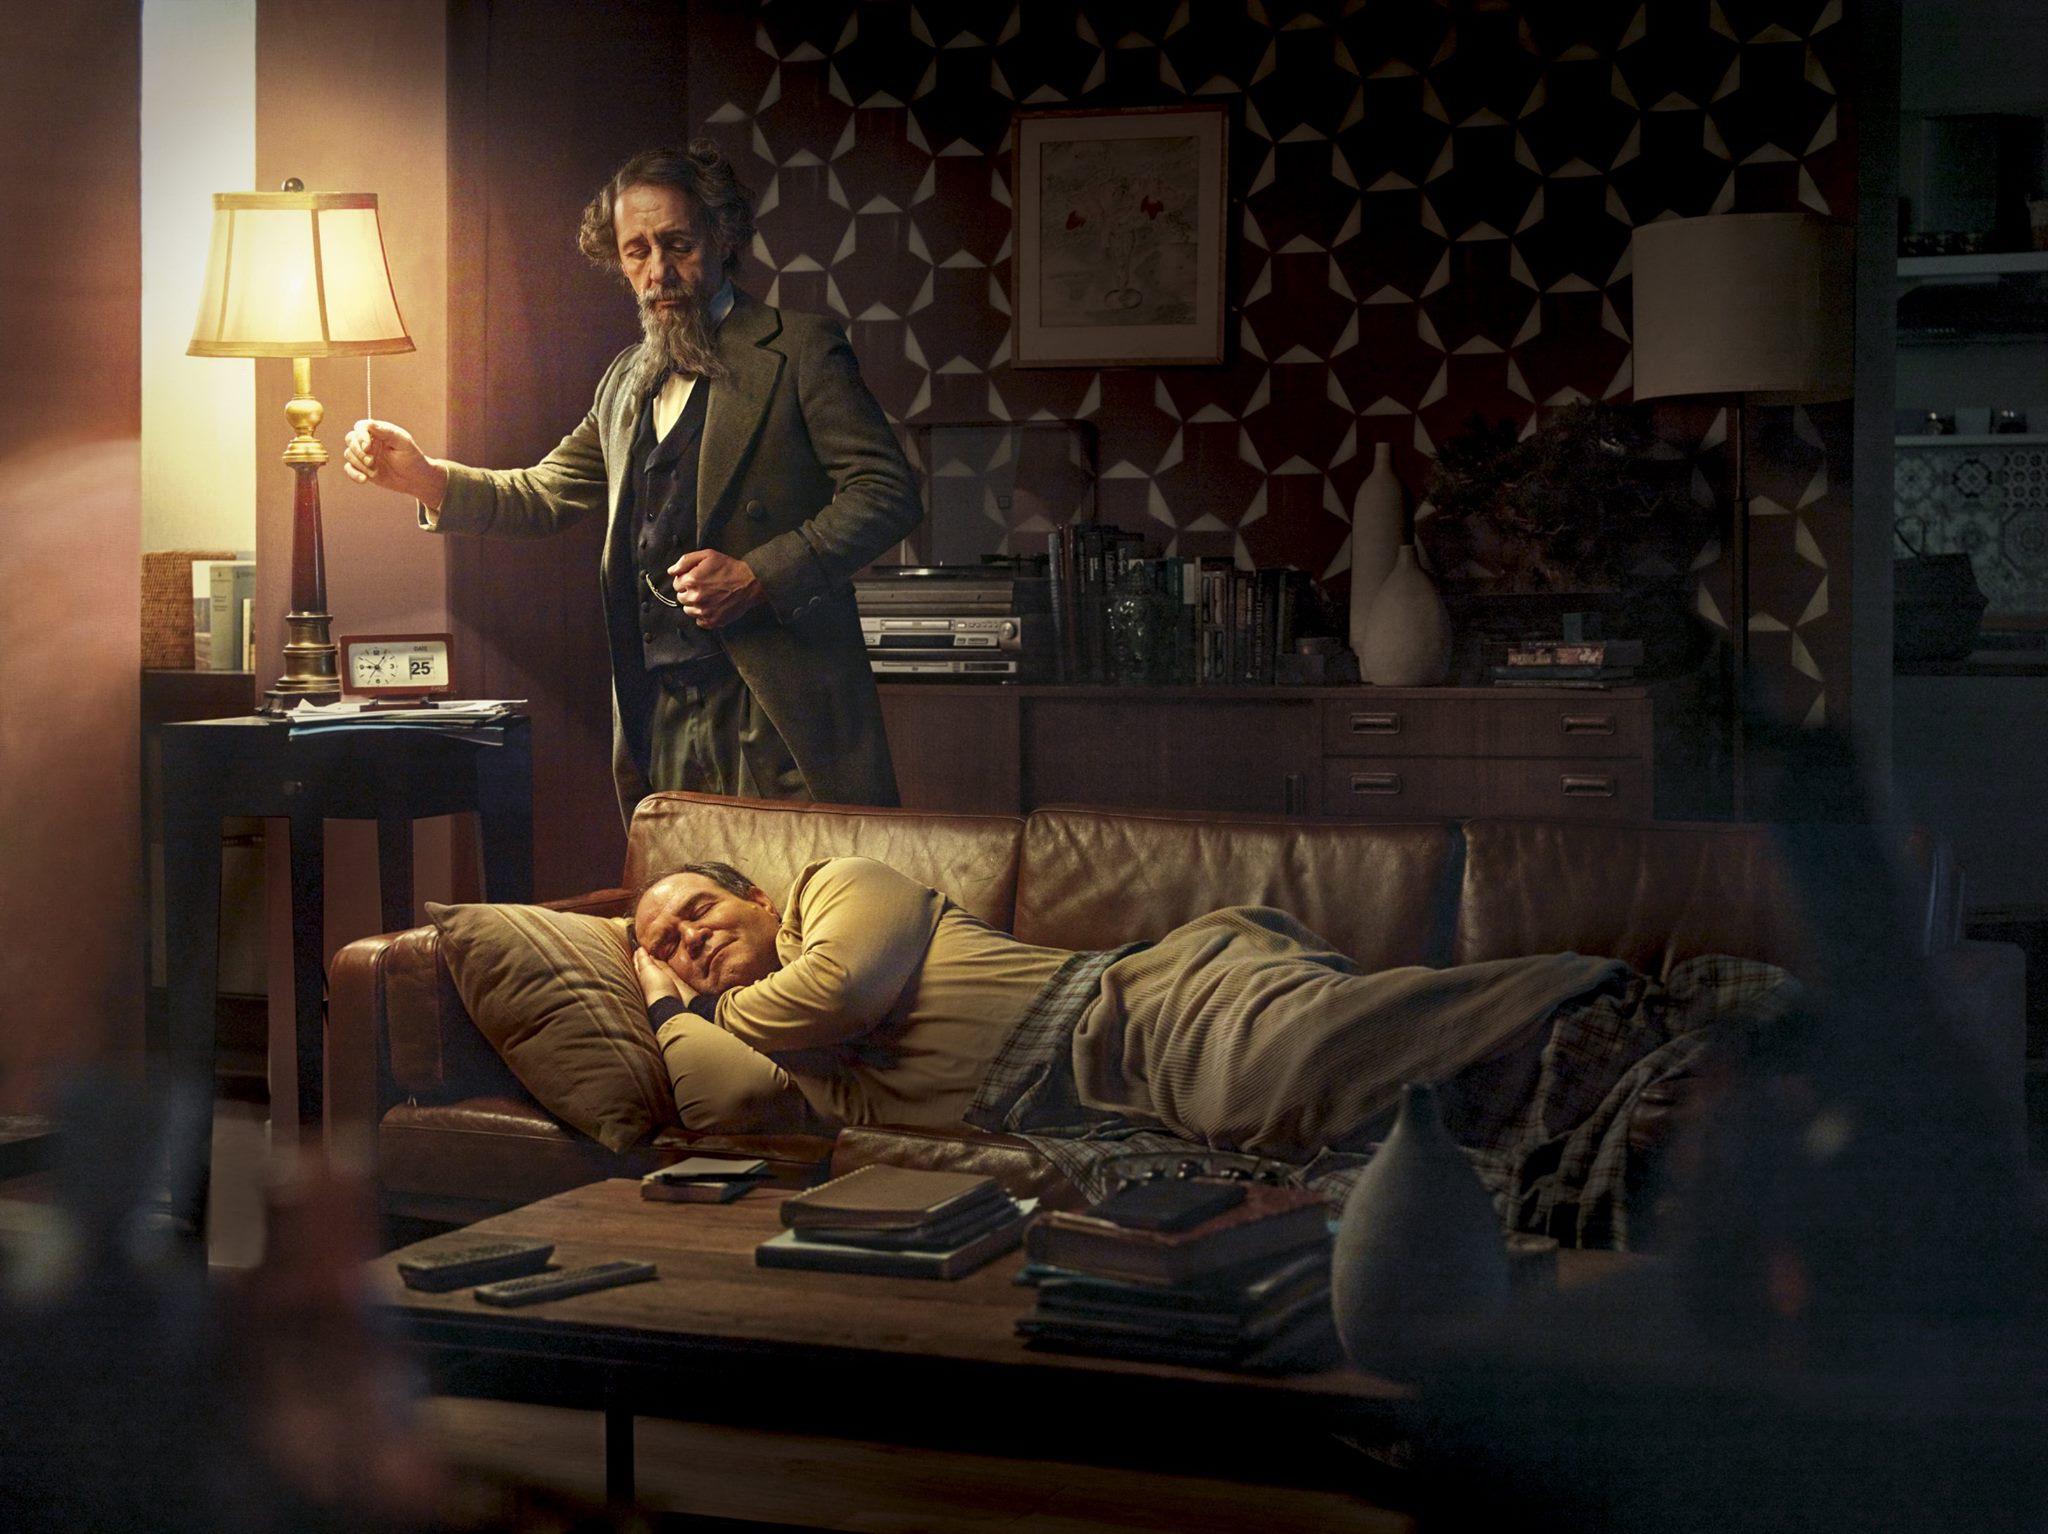 novels help sleep you better campaign – Dubai _1